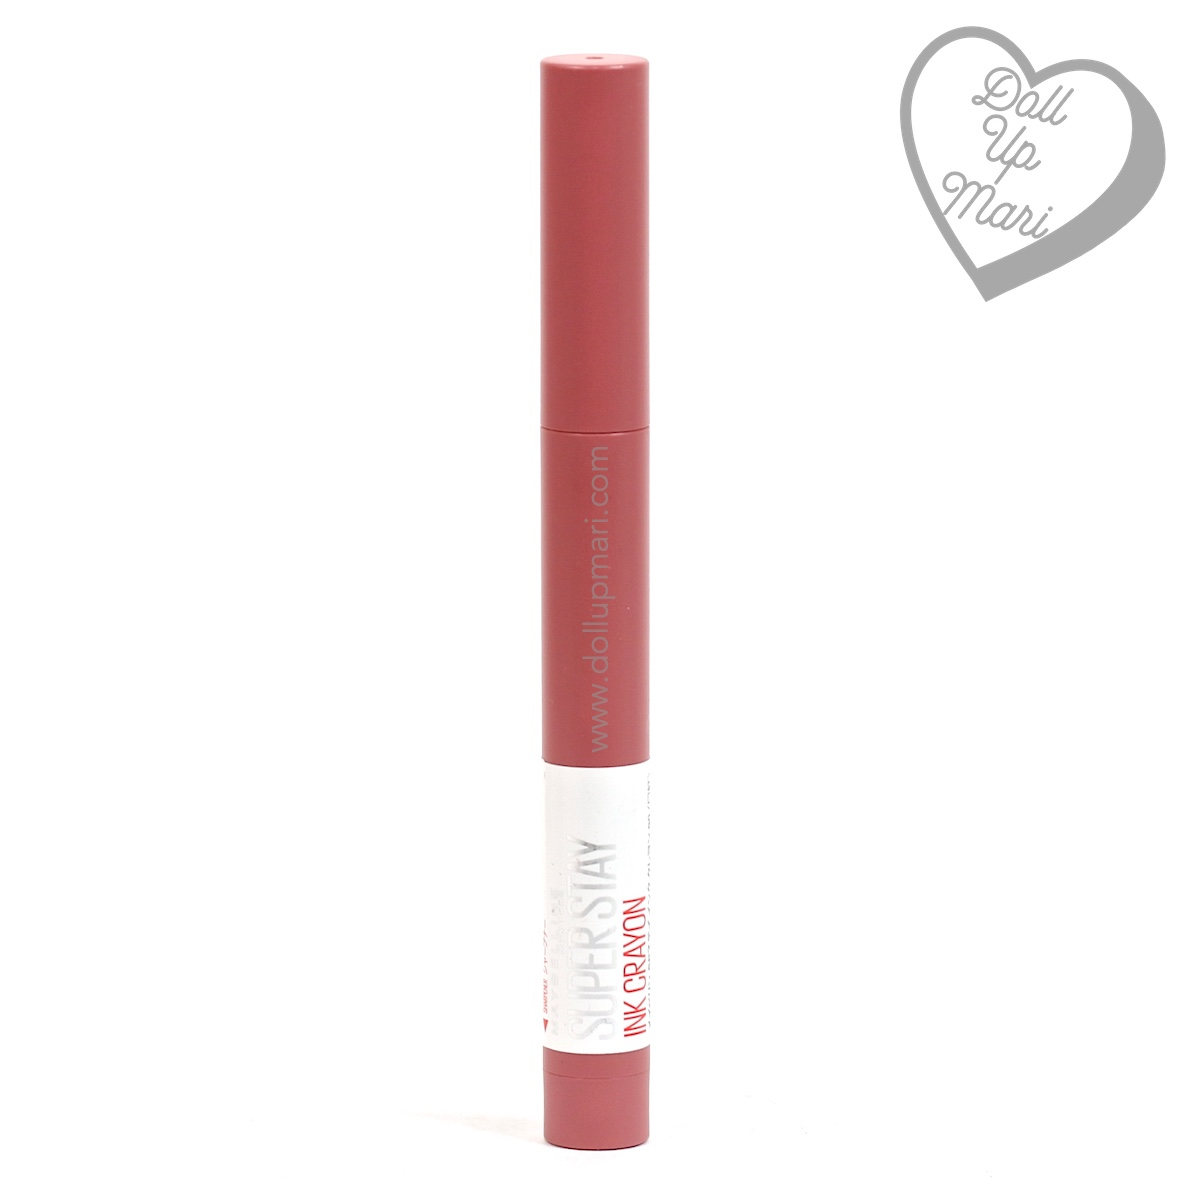 pack shot of 90 Keep It Fun shade of Maybelline Superstay Ink Crayon 8HR Longwear Matte Lipstick